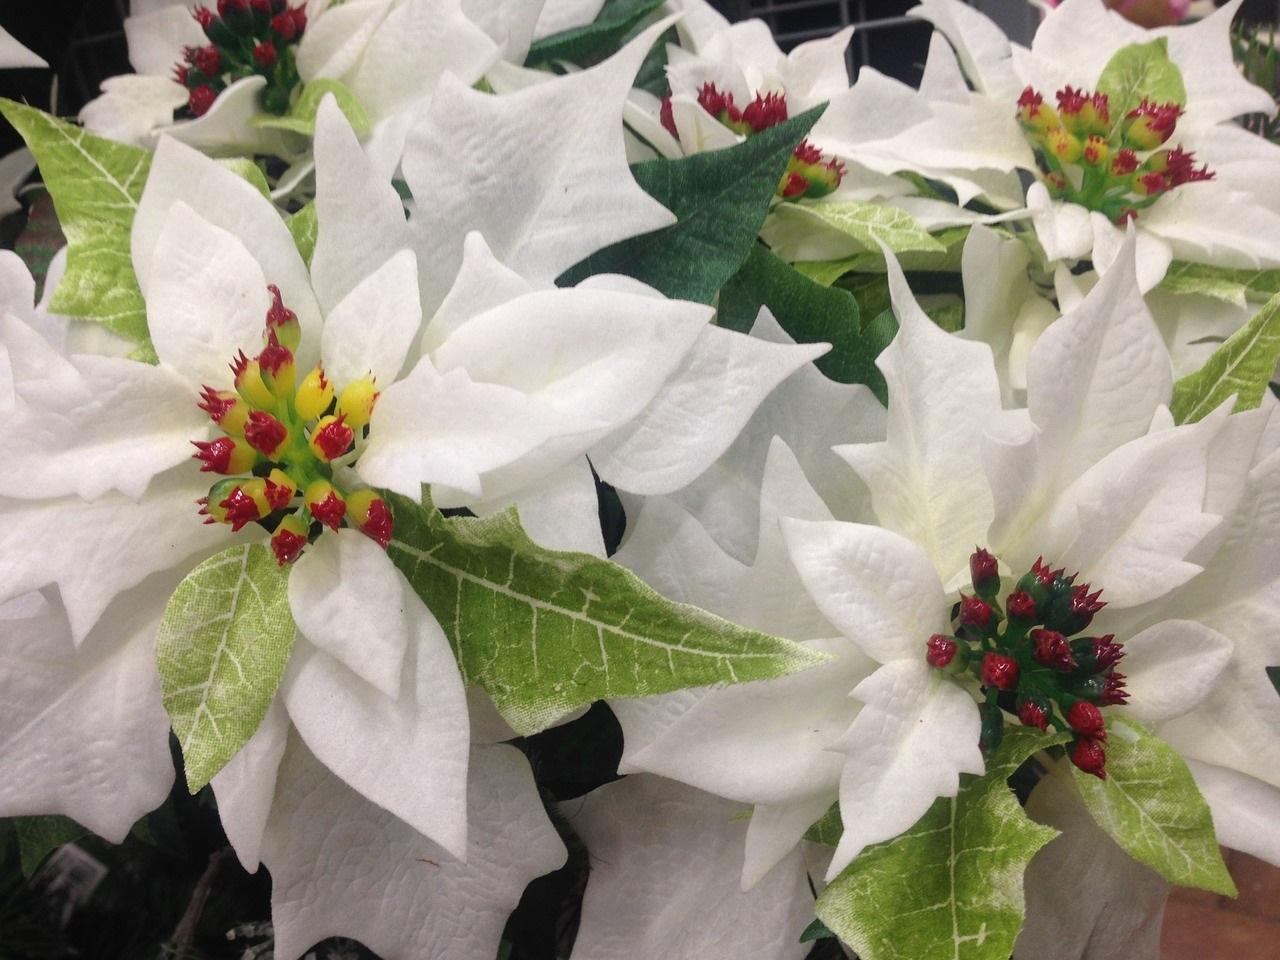 Veggie ideas for Christmas